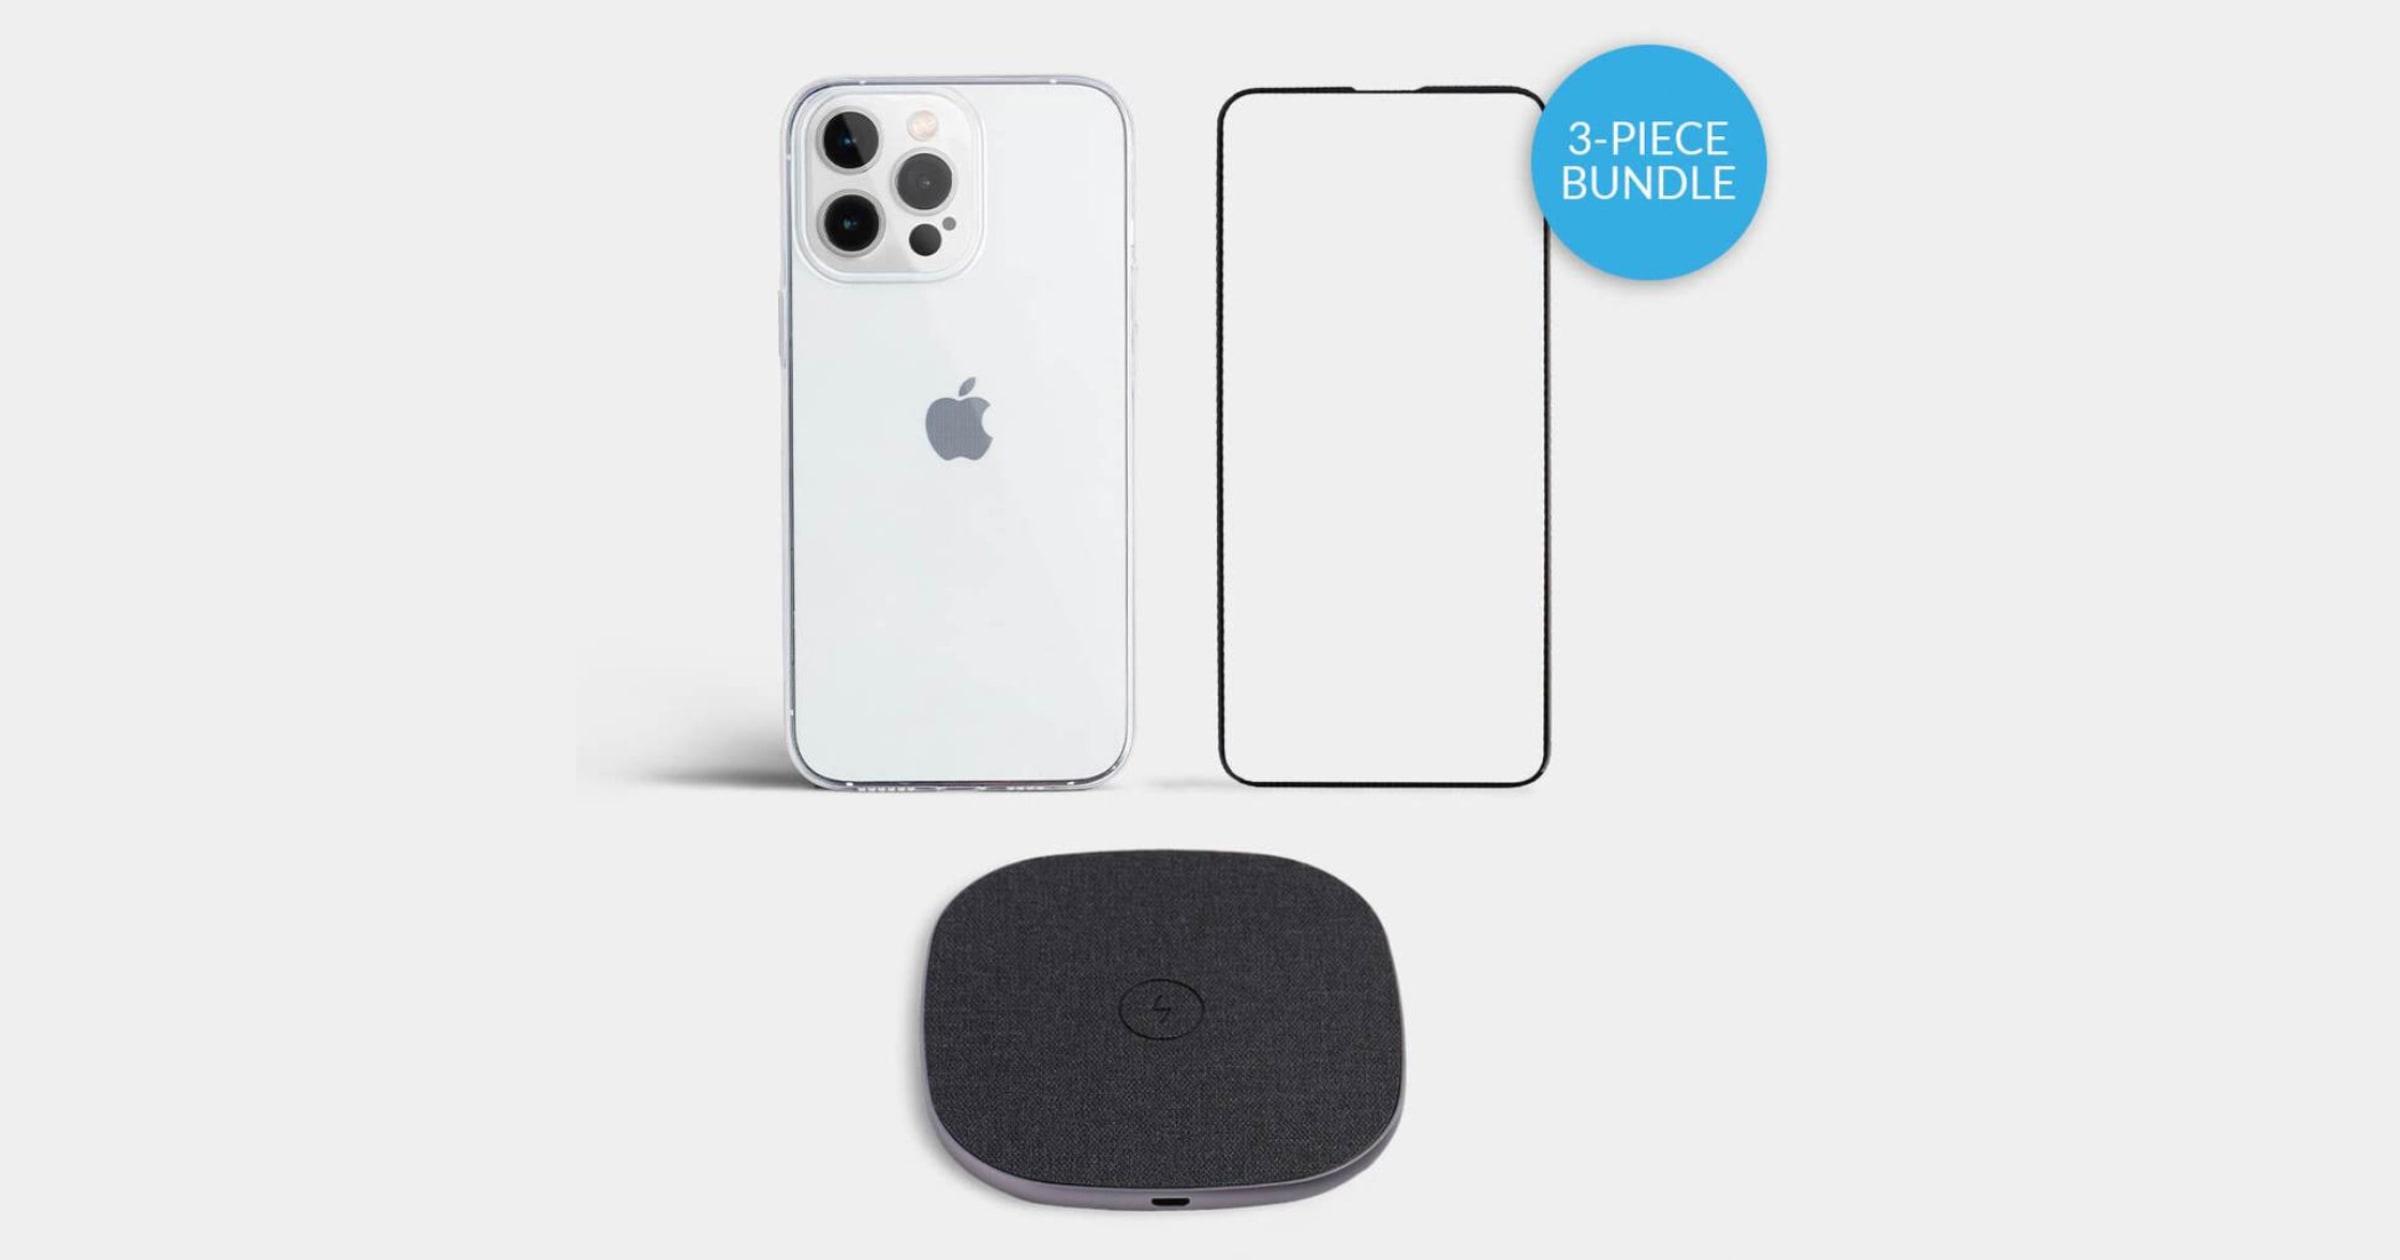 iPhone 13 accessory bundle